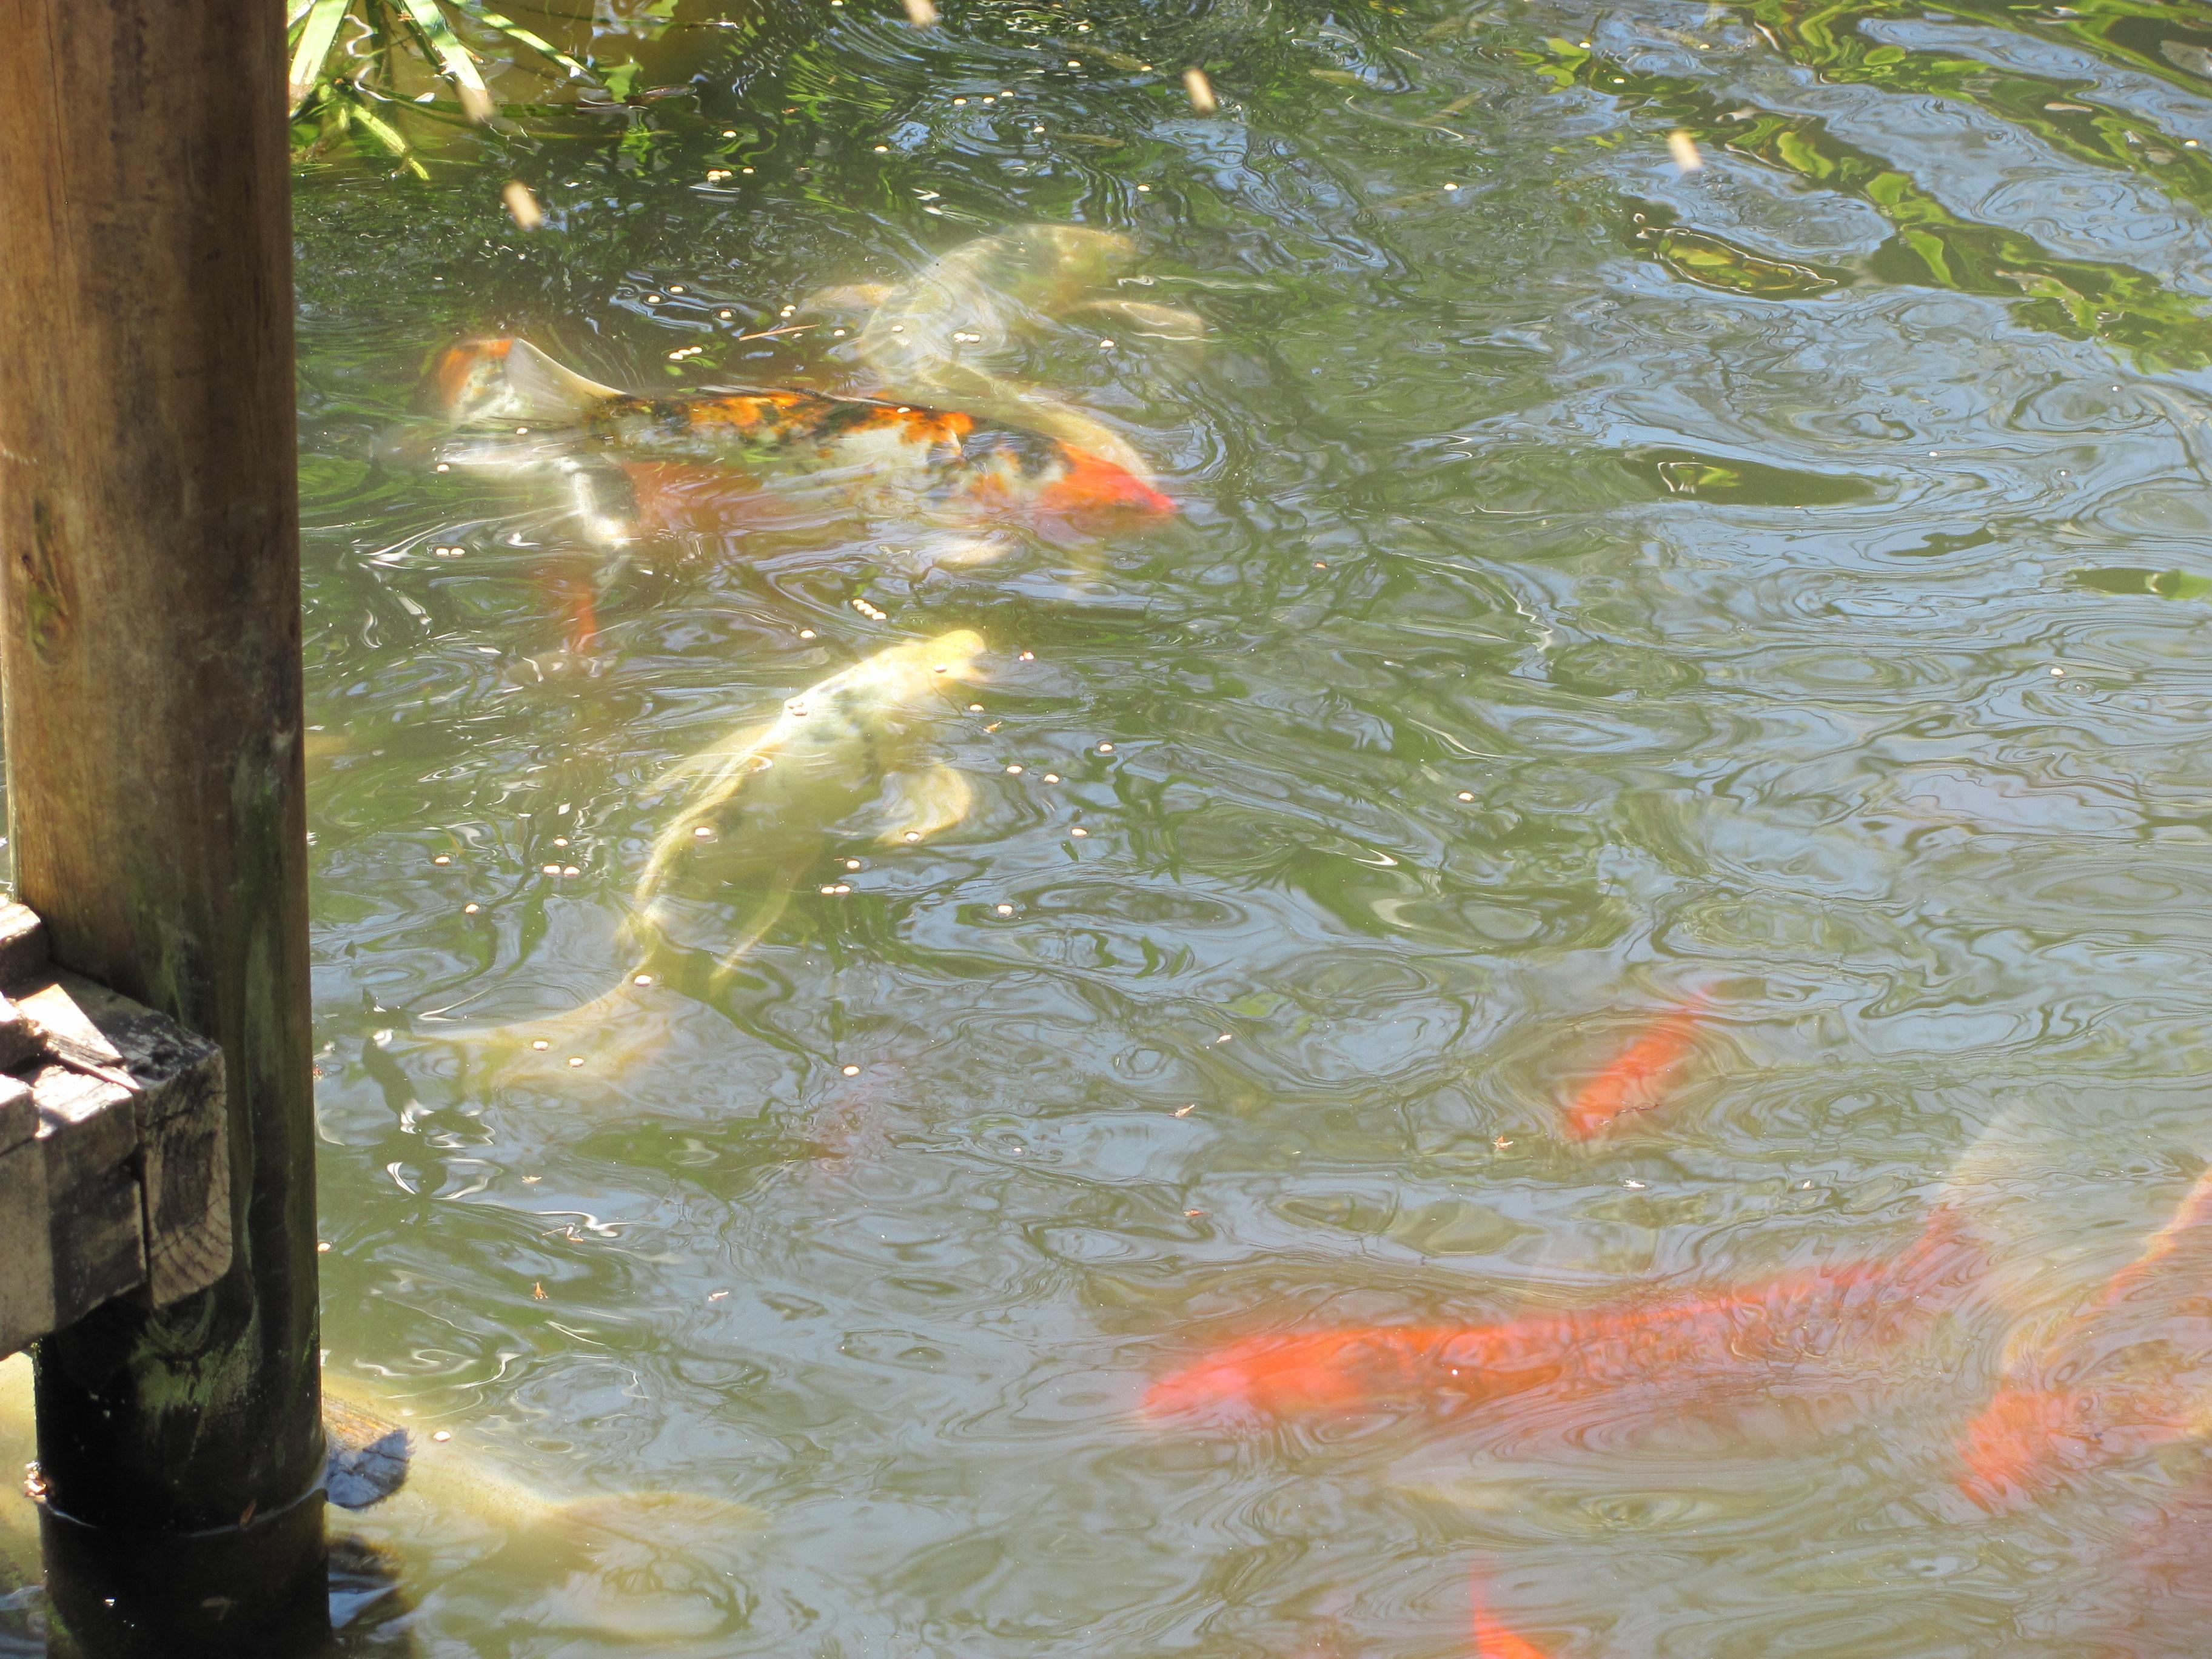 Koi and gold fish 2 by dragonladyslair on deviantart for Koi fish and goldfish